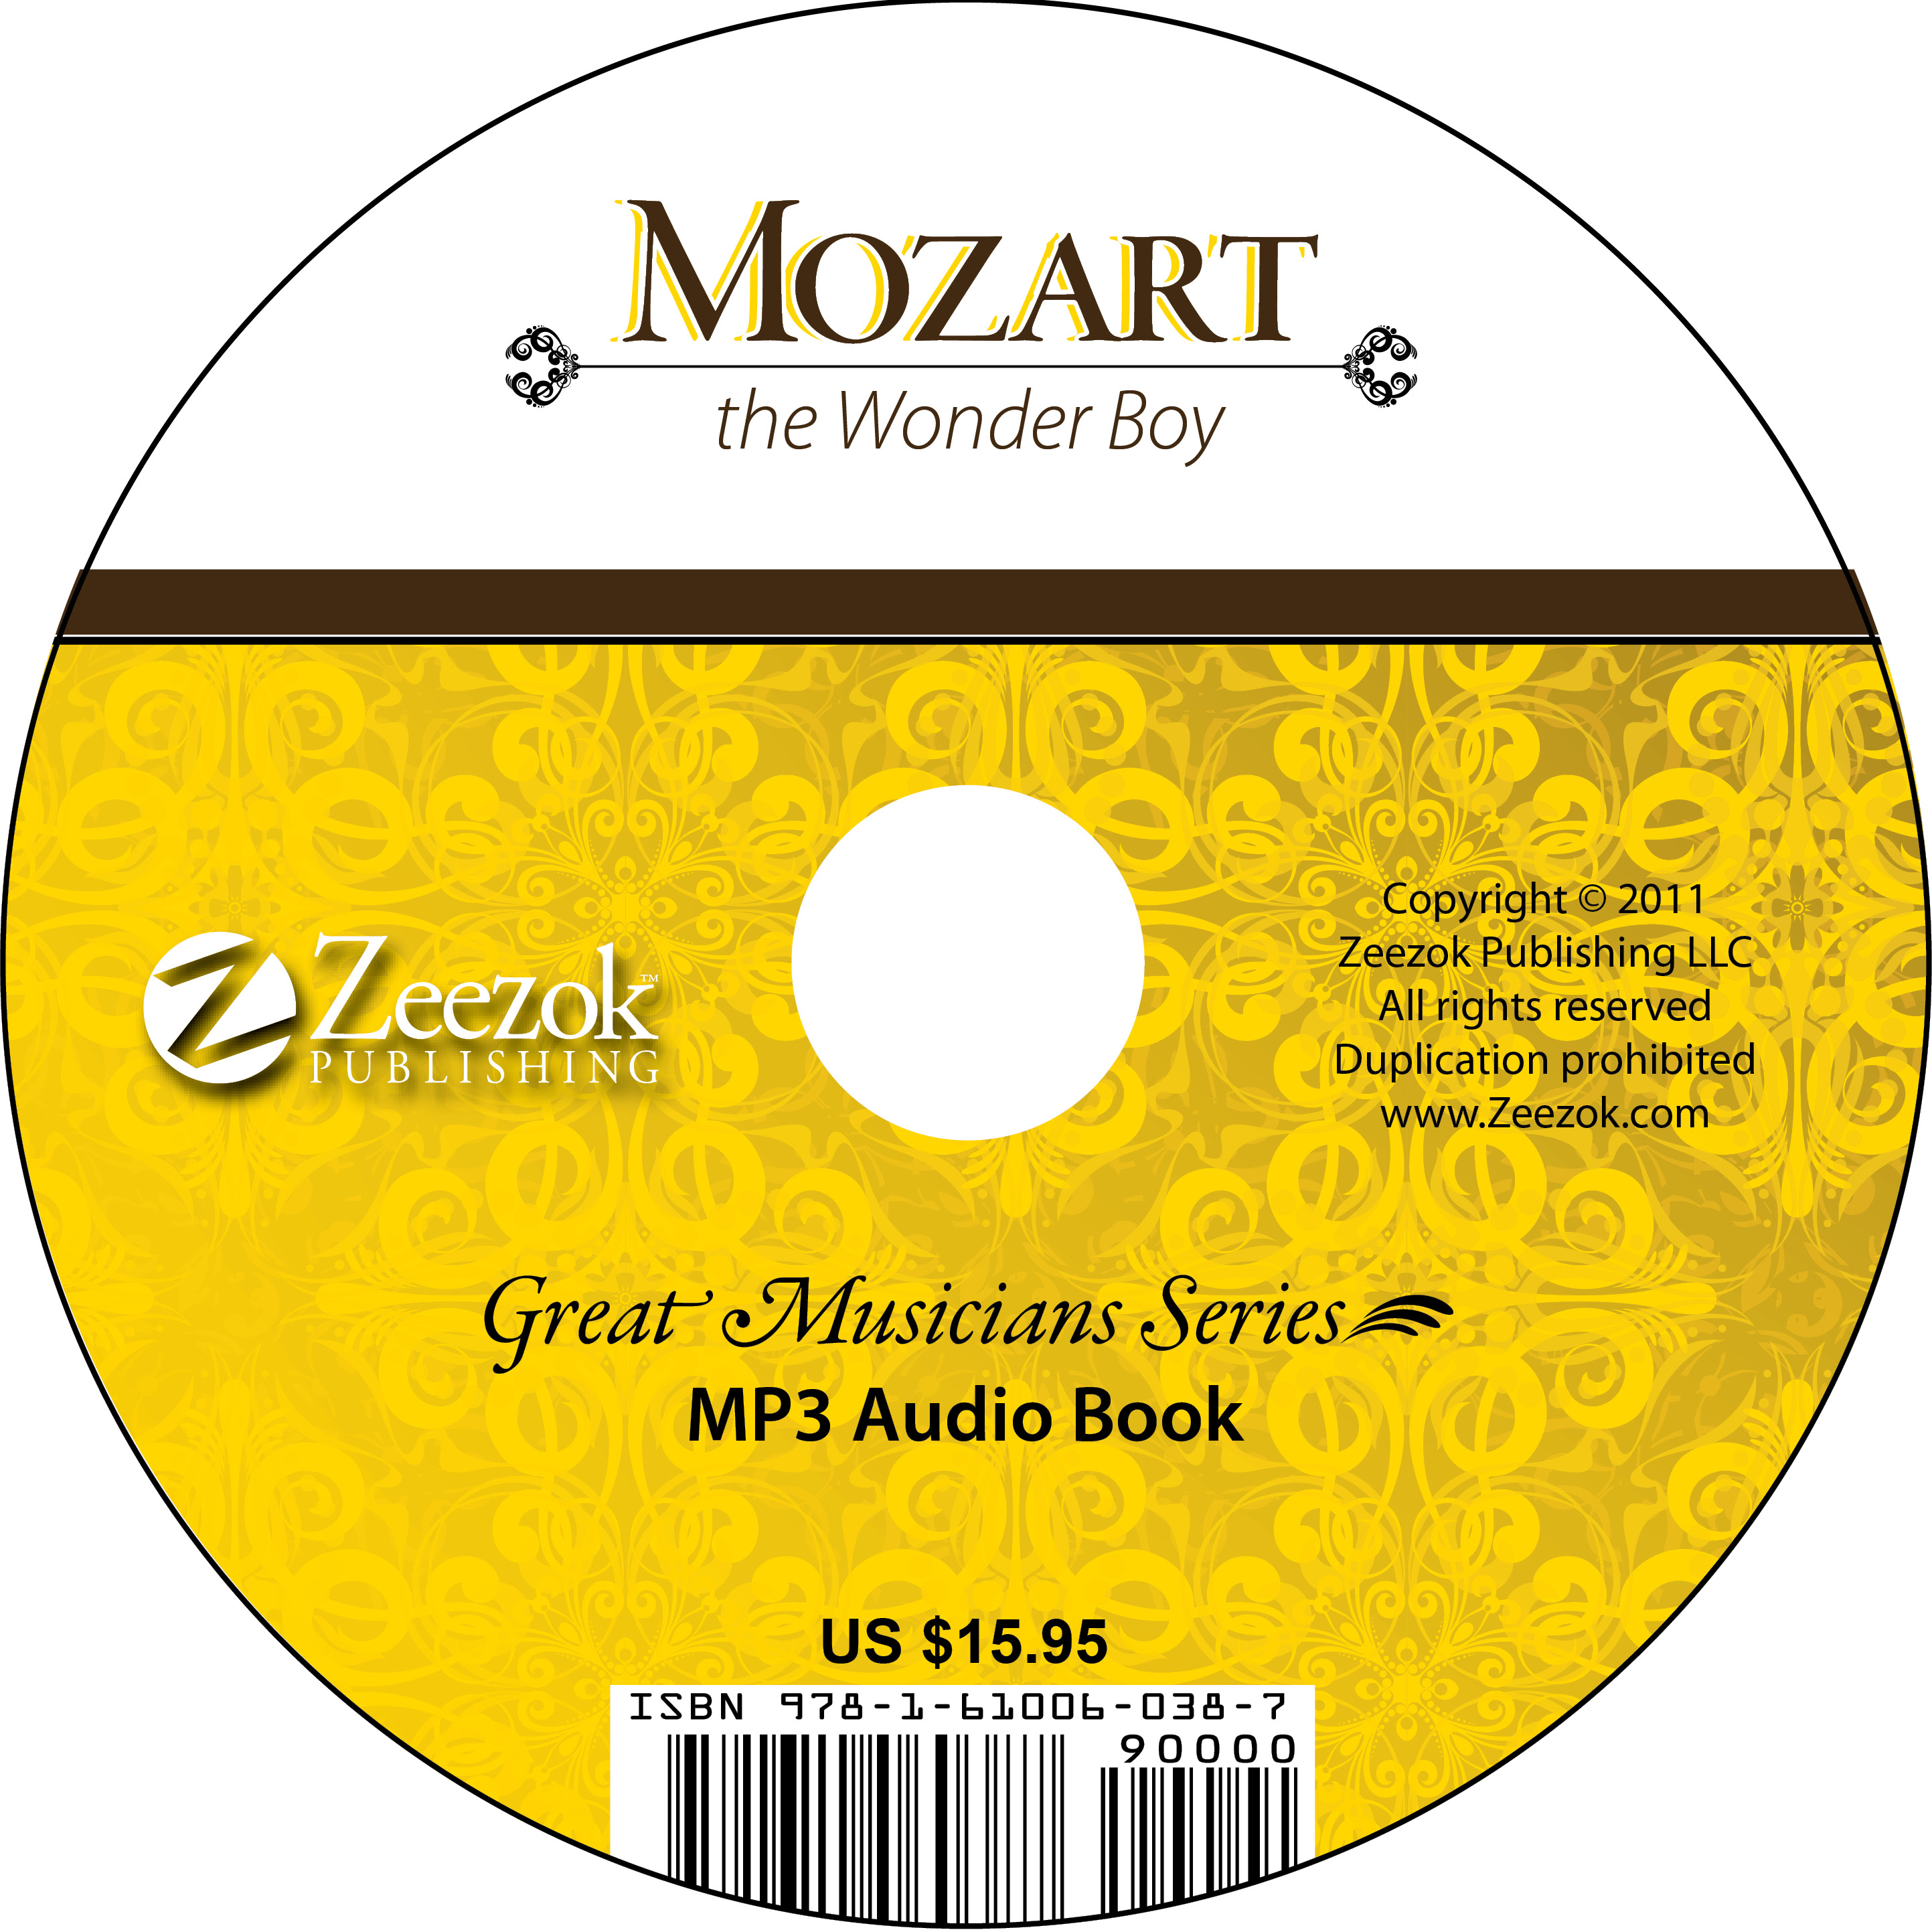 Mozart, The Wonder Boy Audio Book on CD (MP3 format) - photo#17